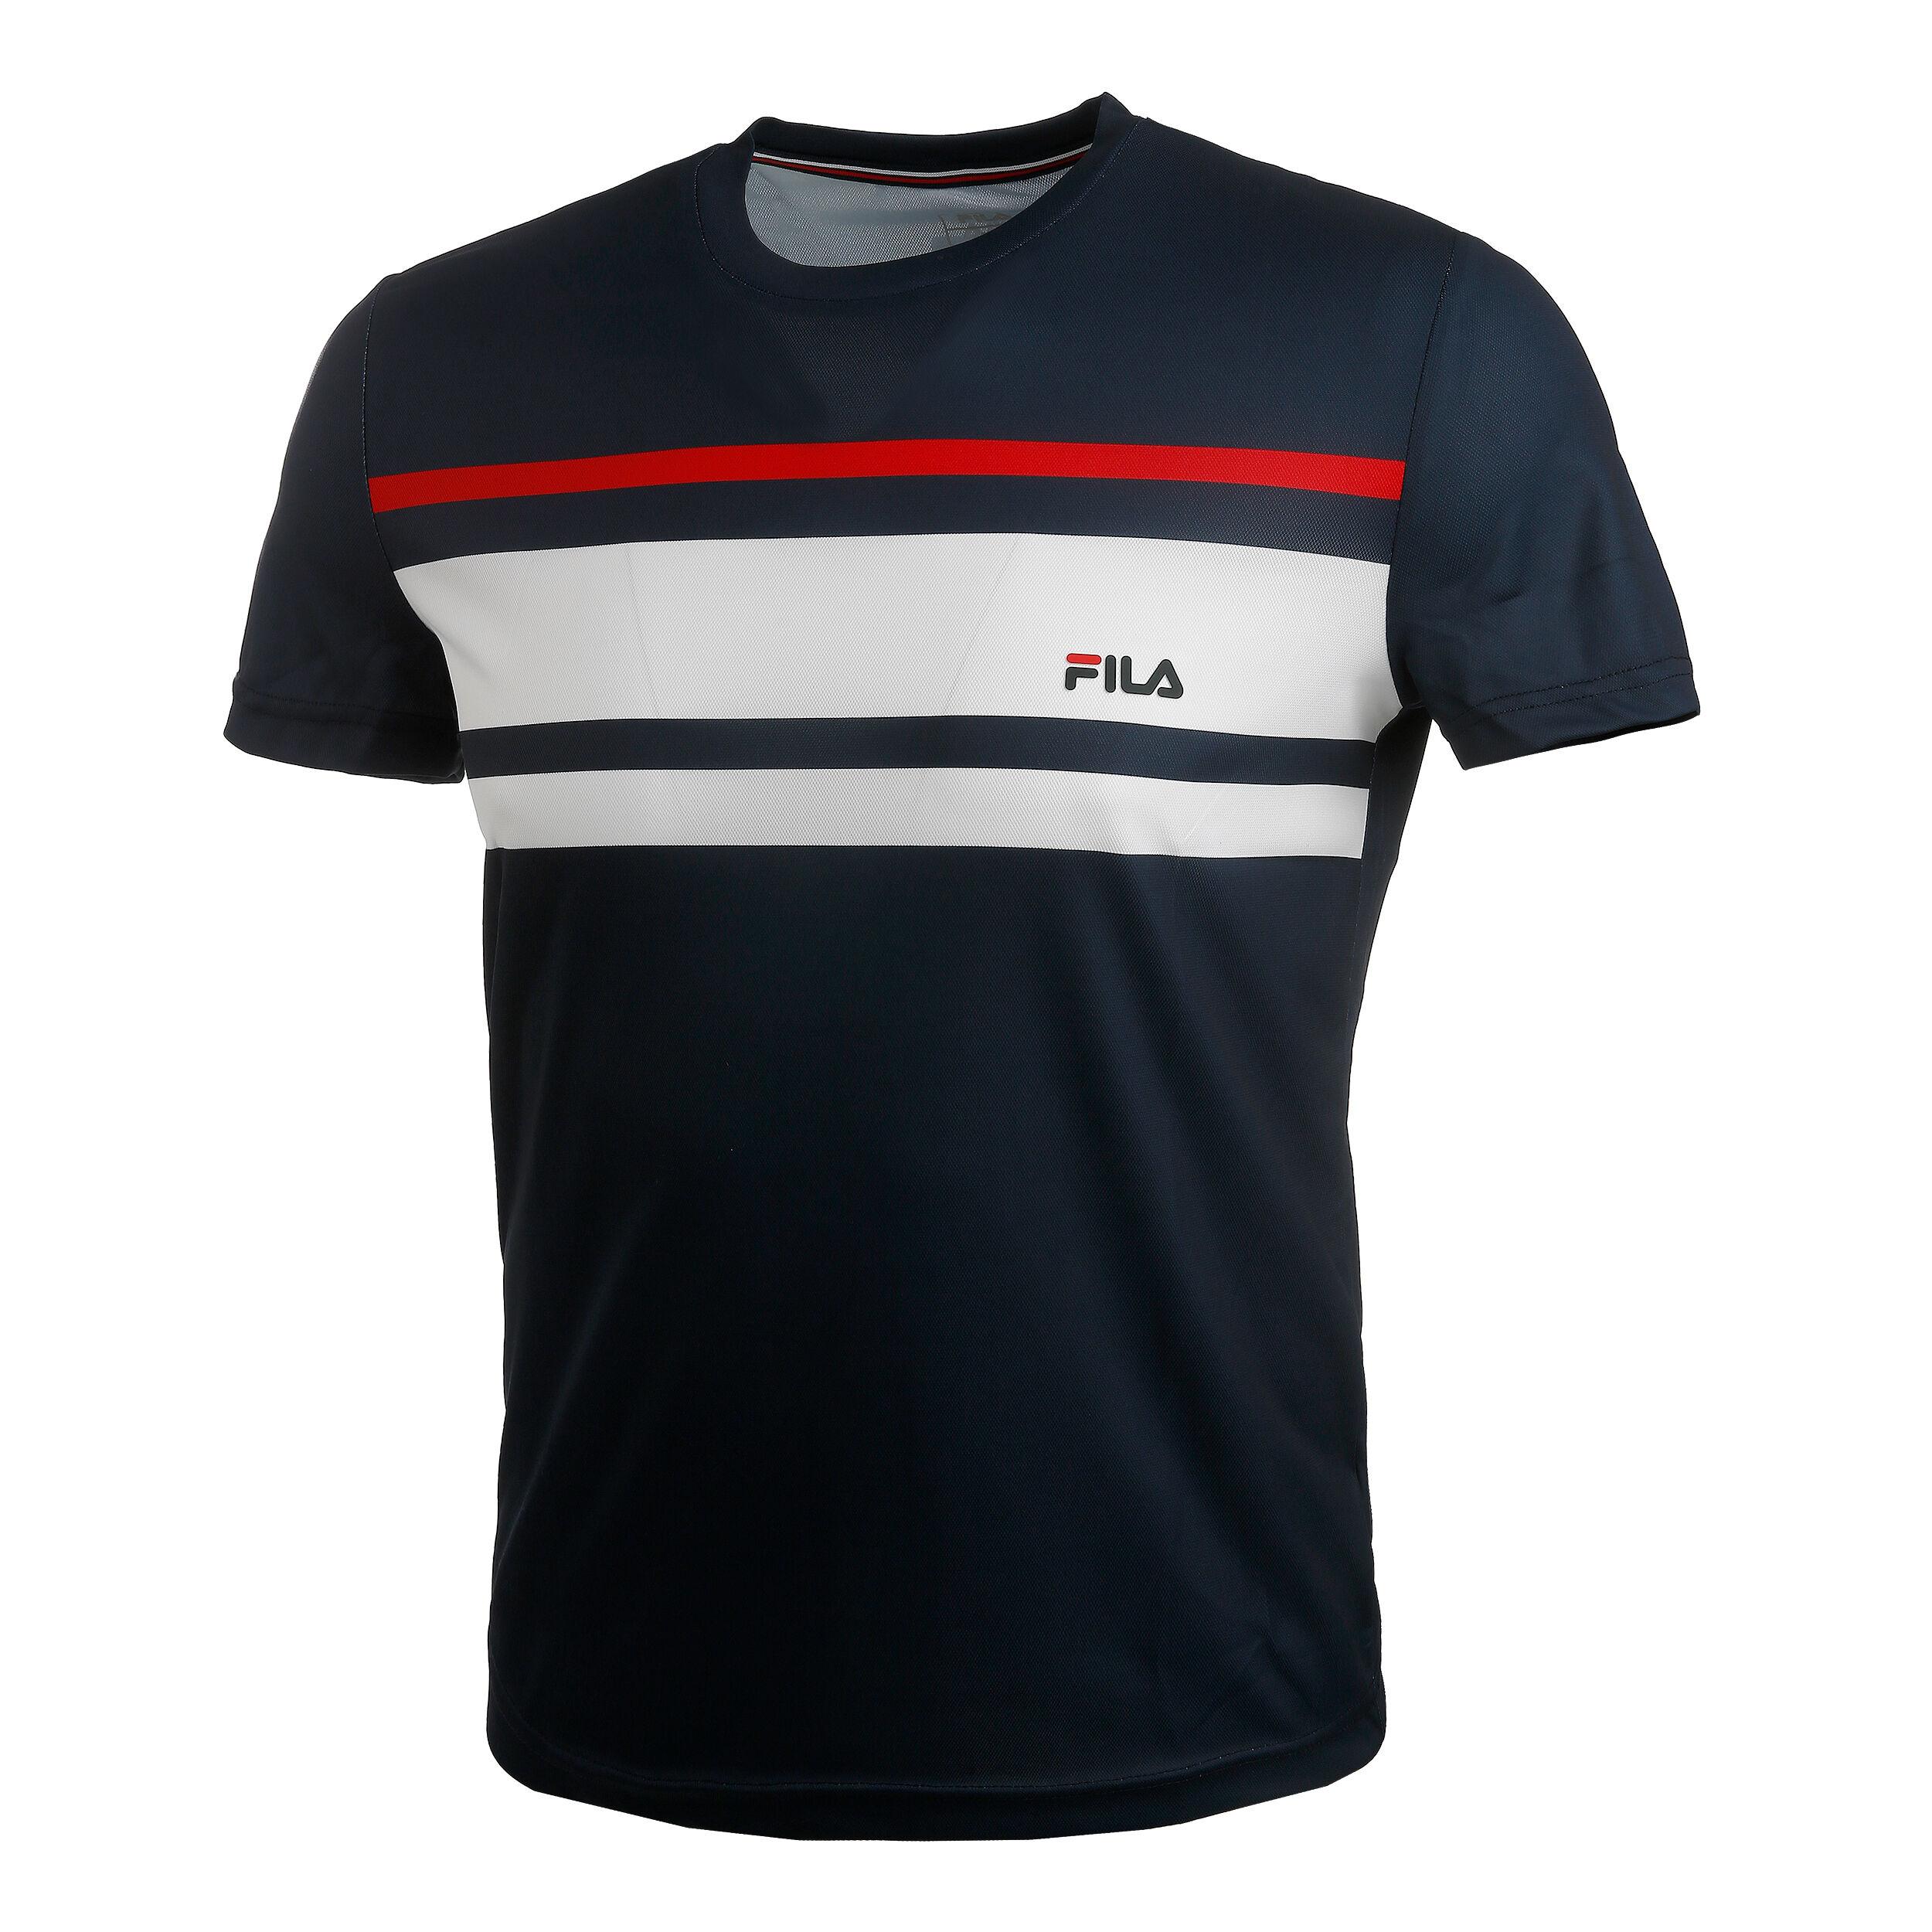 Trey T Shirt Herren Dunkelblau, Weiß